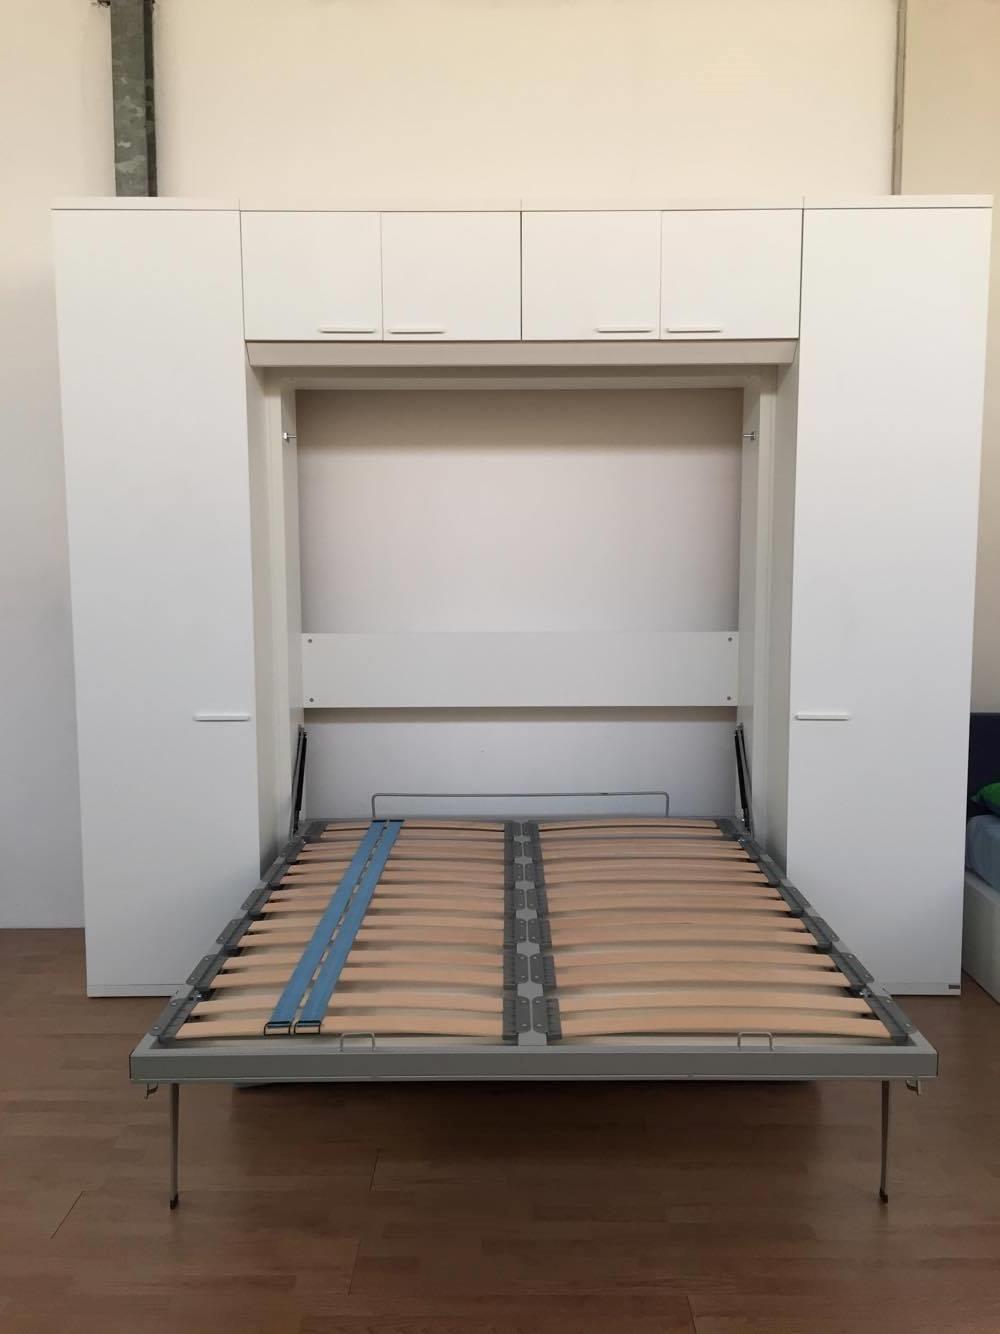 Mobile Letto Ikea - Modelos De Casas - Justrigs.com